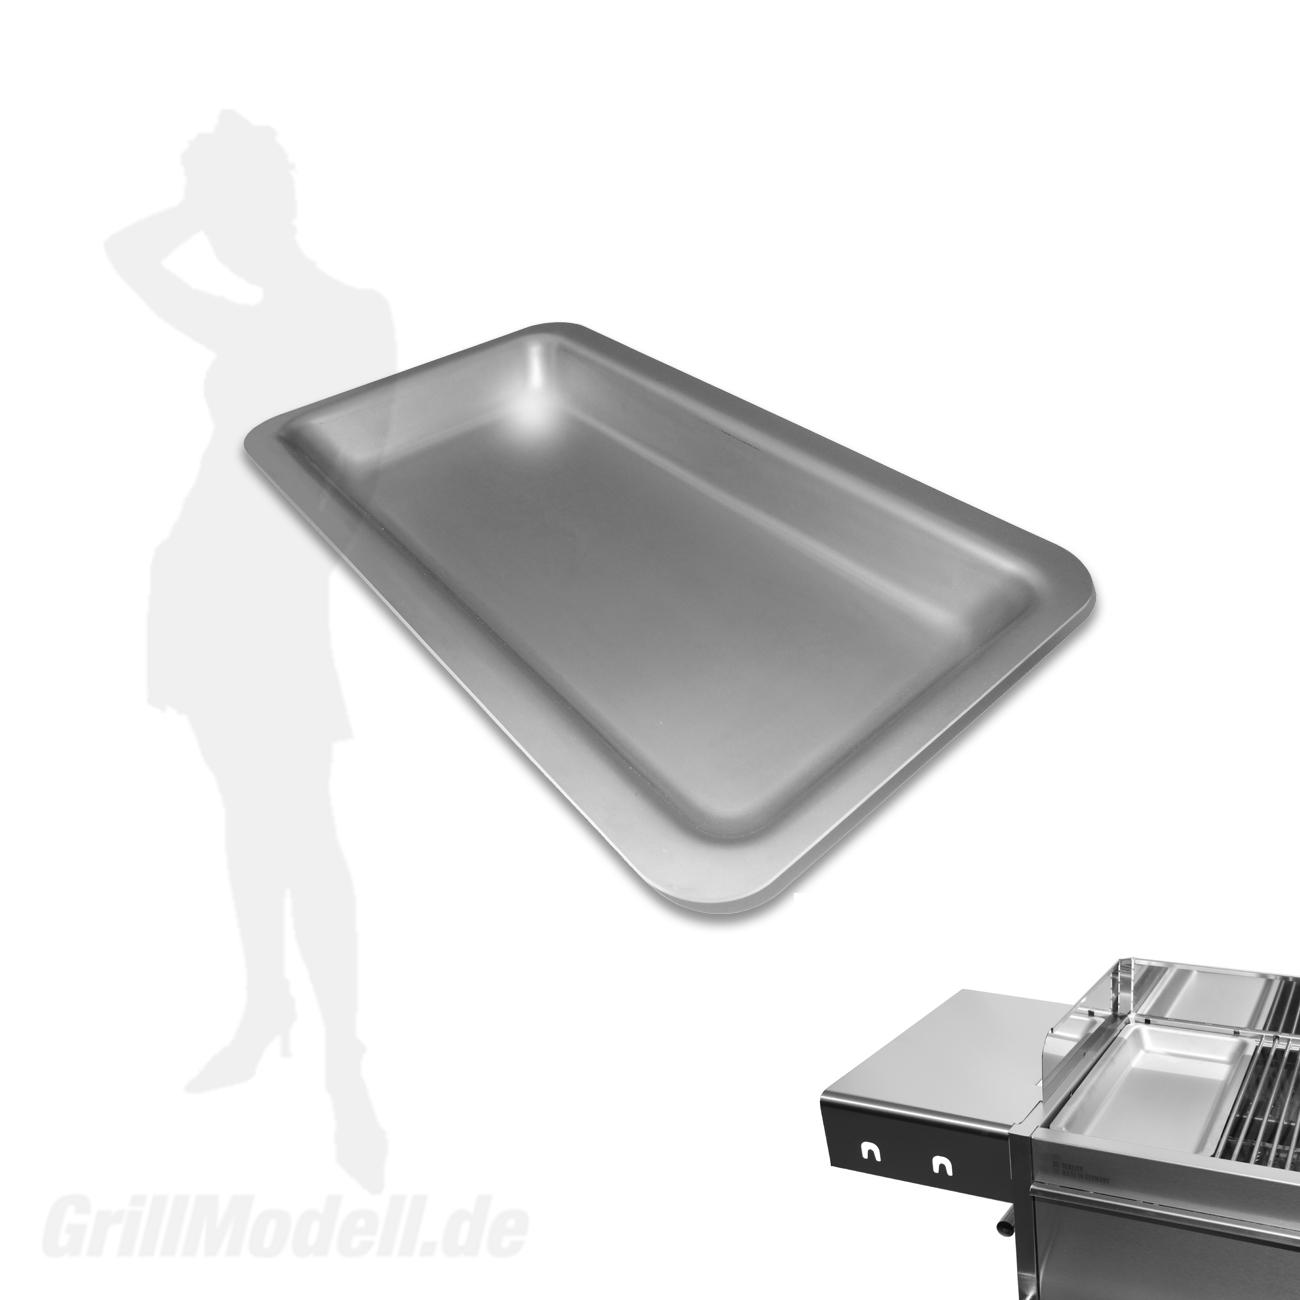 Edelstahl Grillplatte für Edelstahlgrill Holzkohlegrill Edelstar L